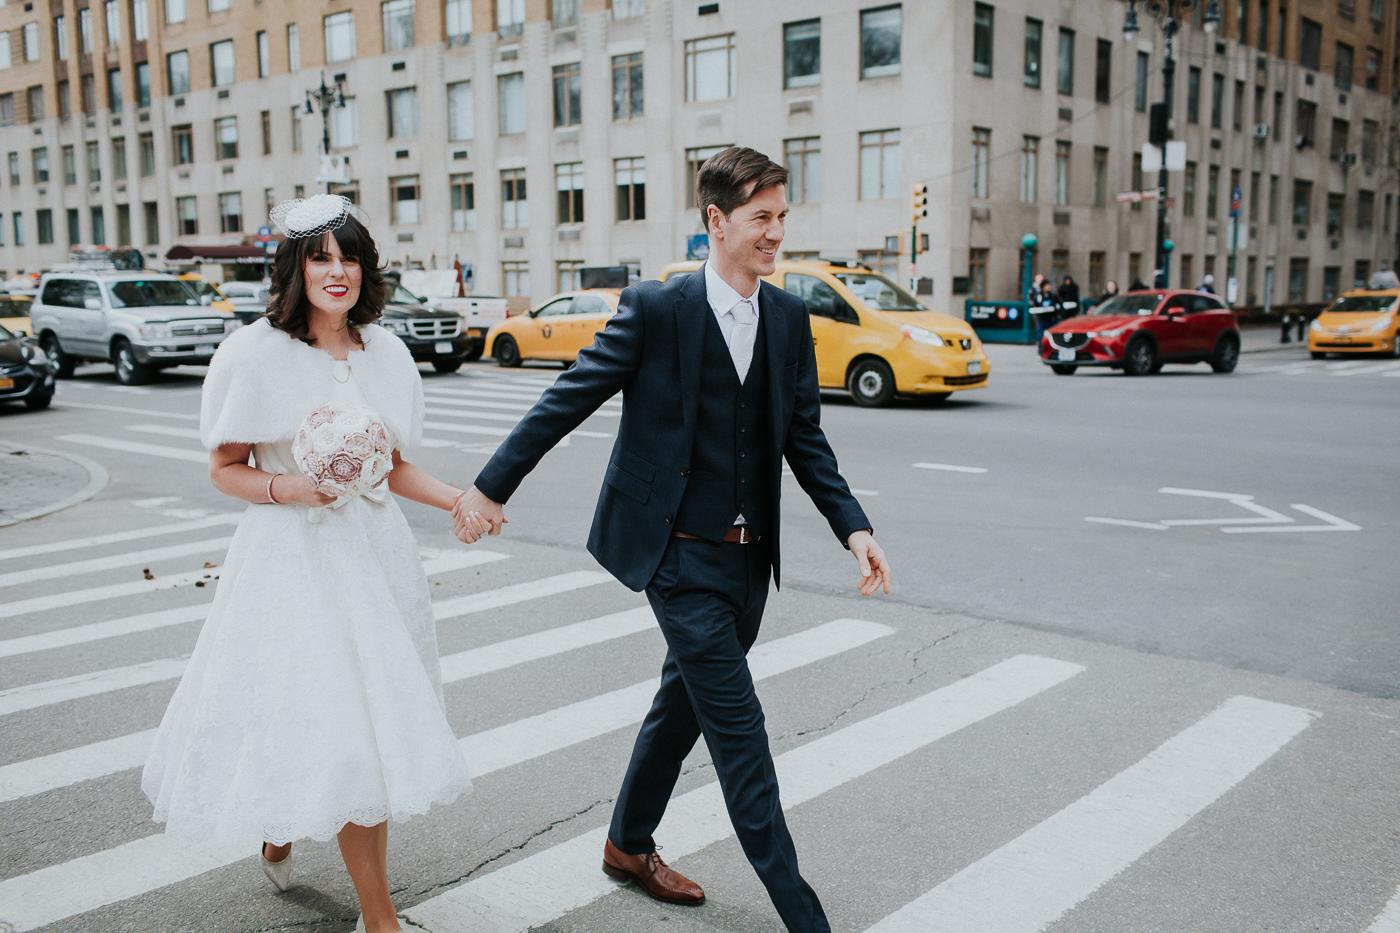 Ladies-Pavilion-Central-Park-NYC-Documentary-Elopement-Wedding-Photographer-15.jpg